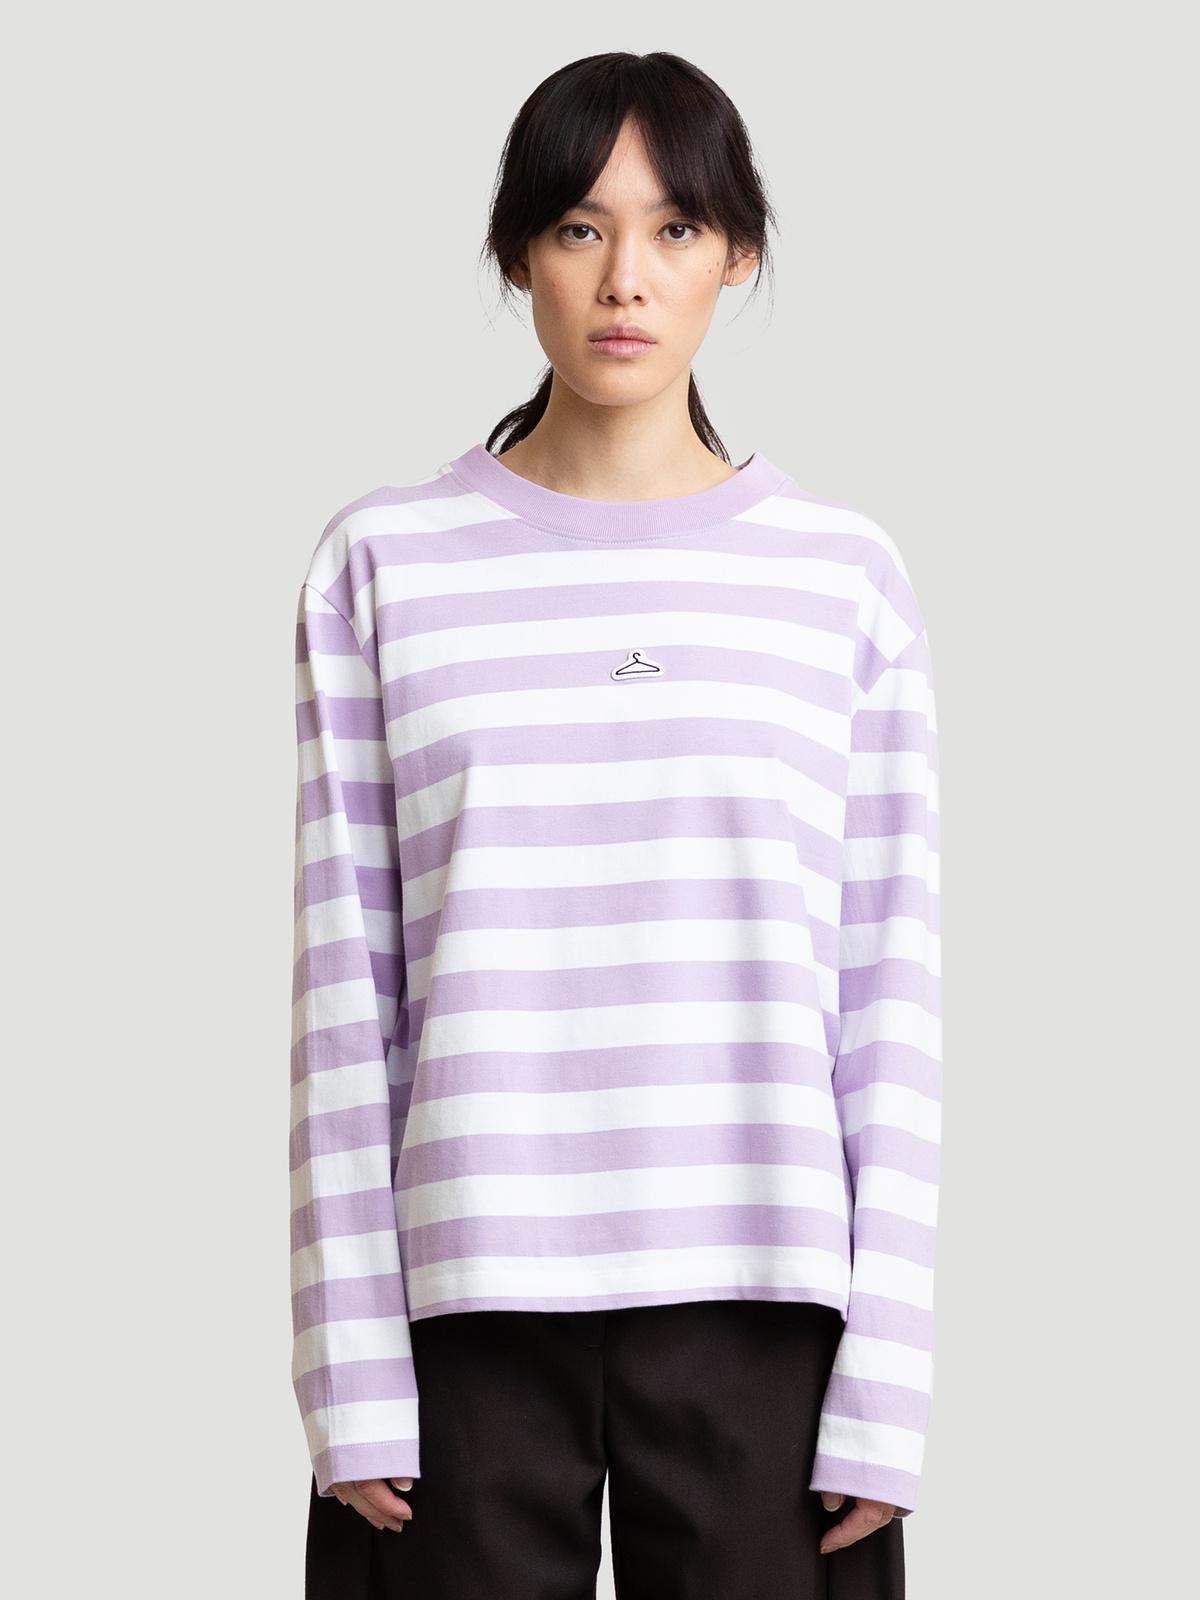 Hanger Striped Longsleeve Lilac White 5